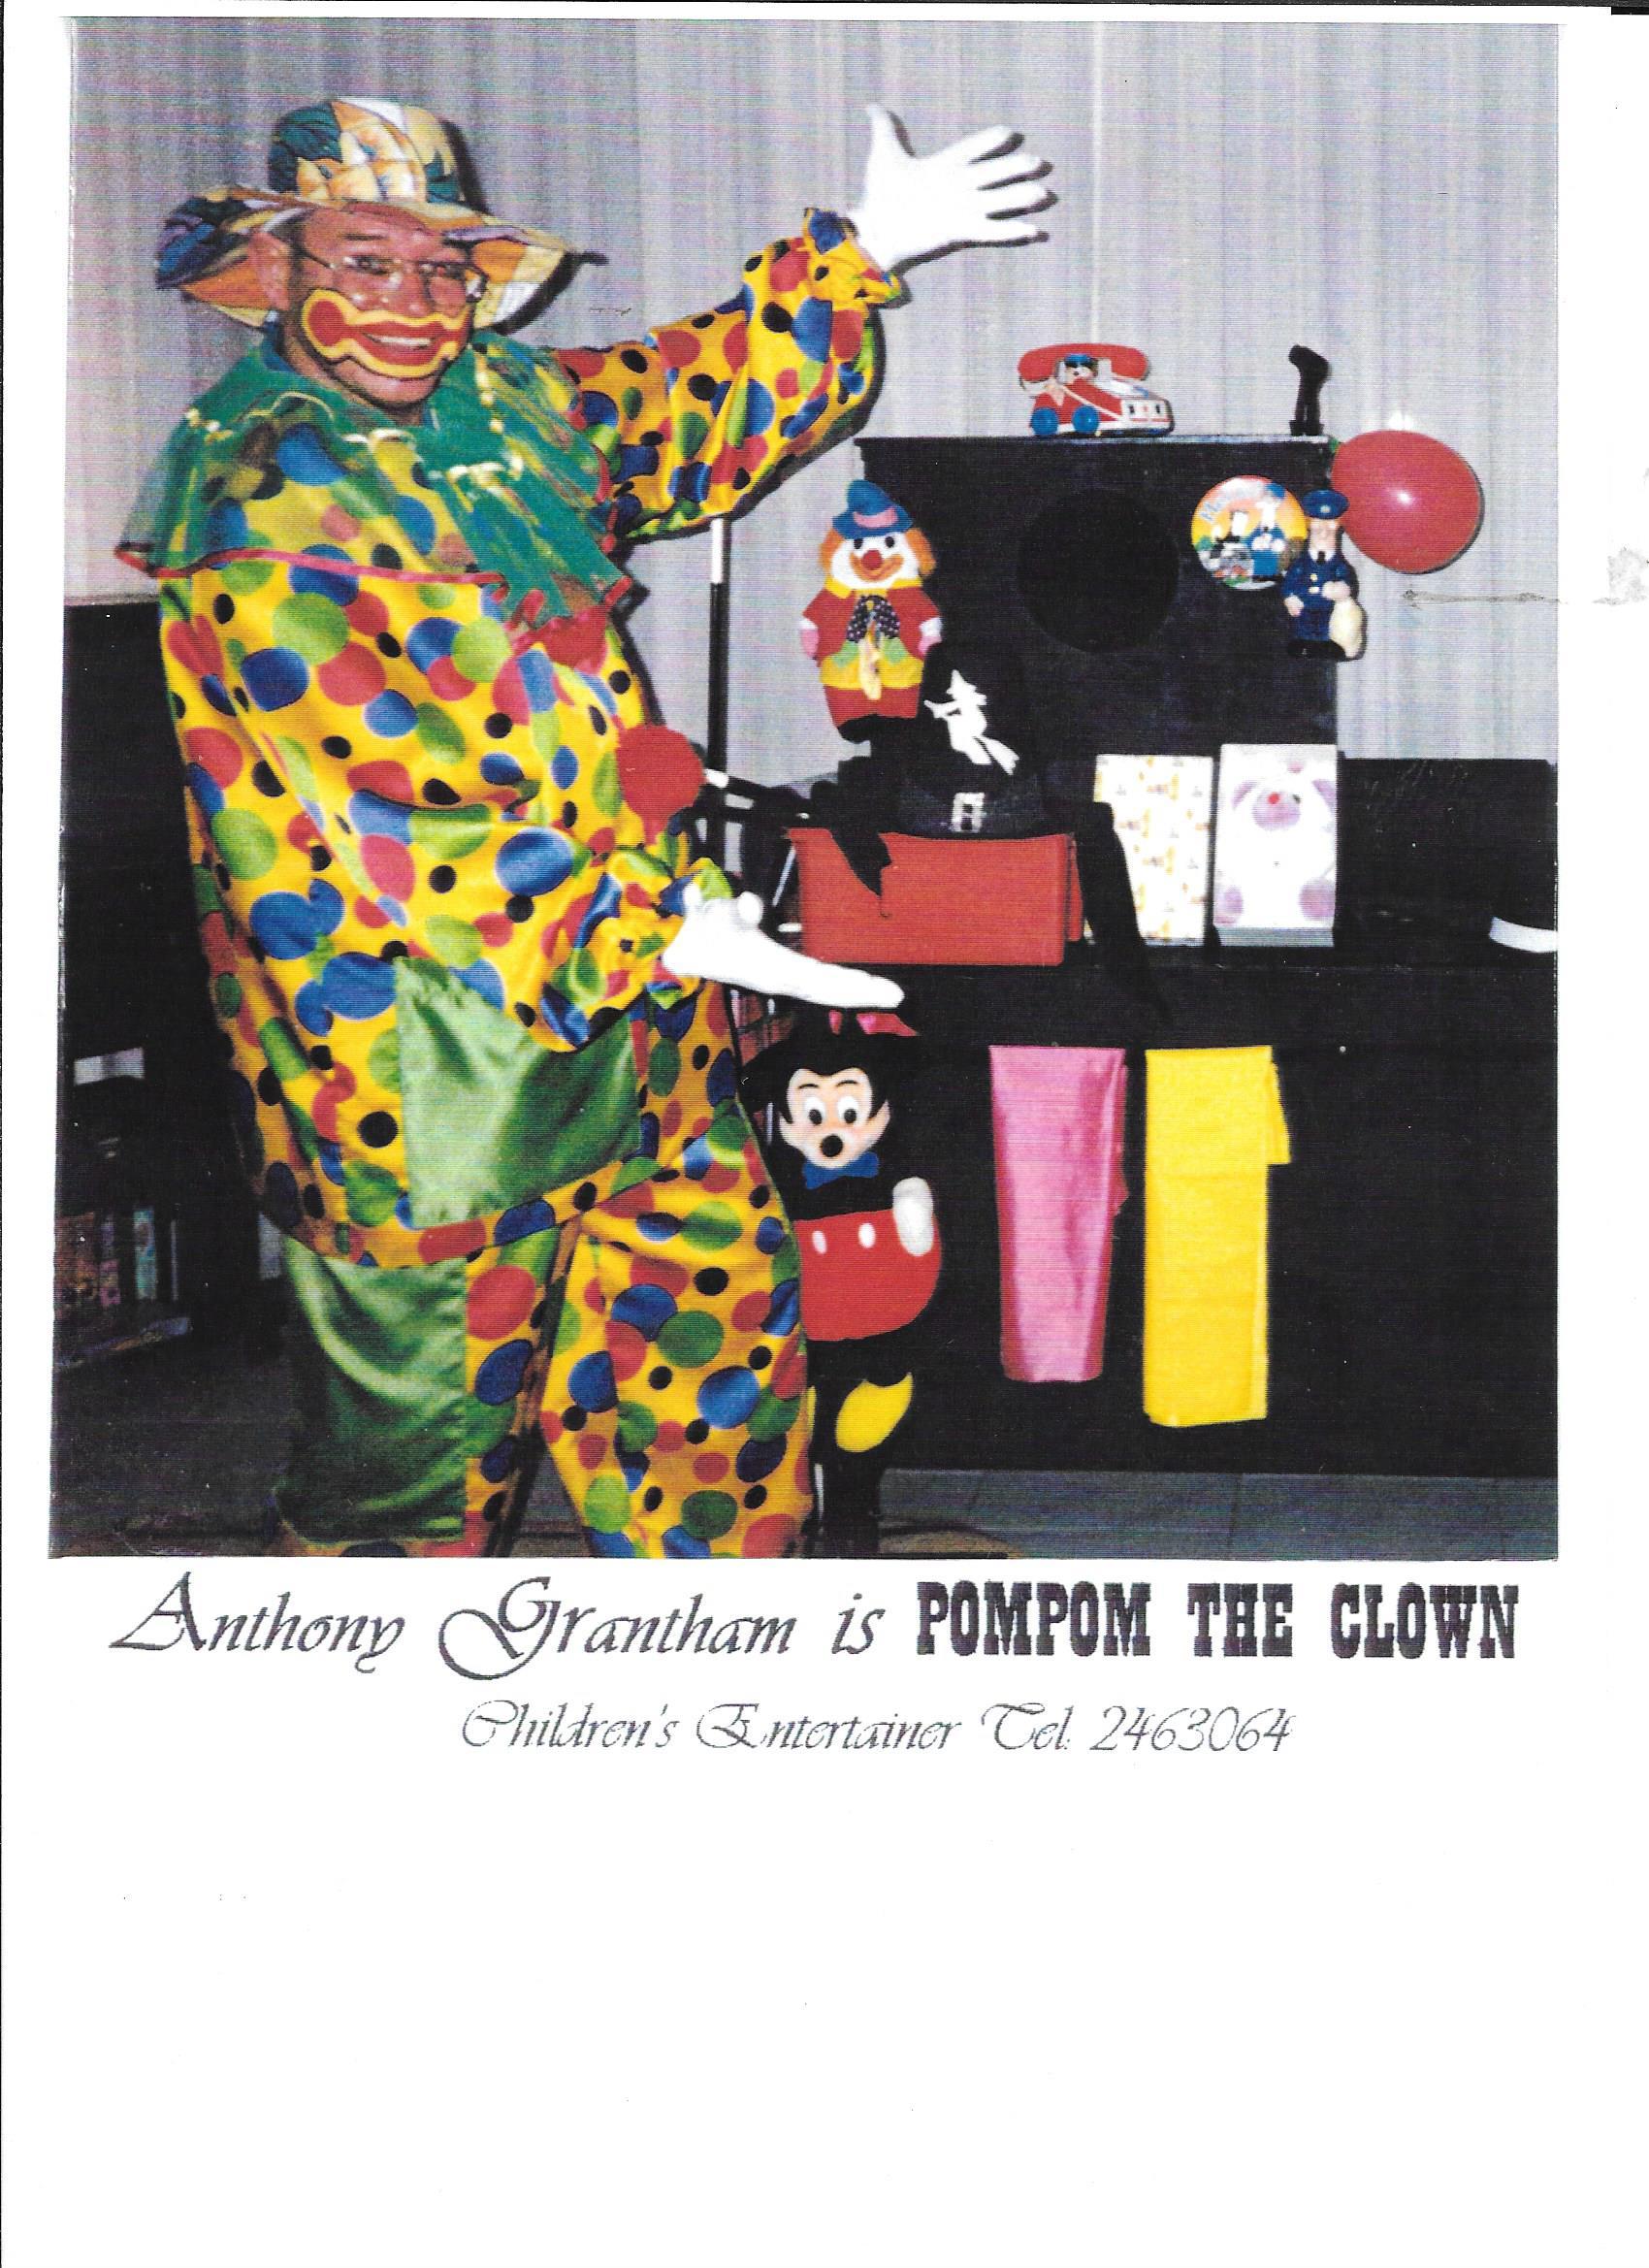 Pom Pom the Clown